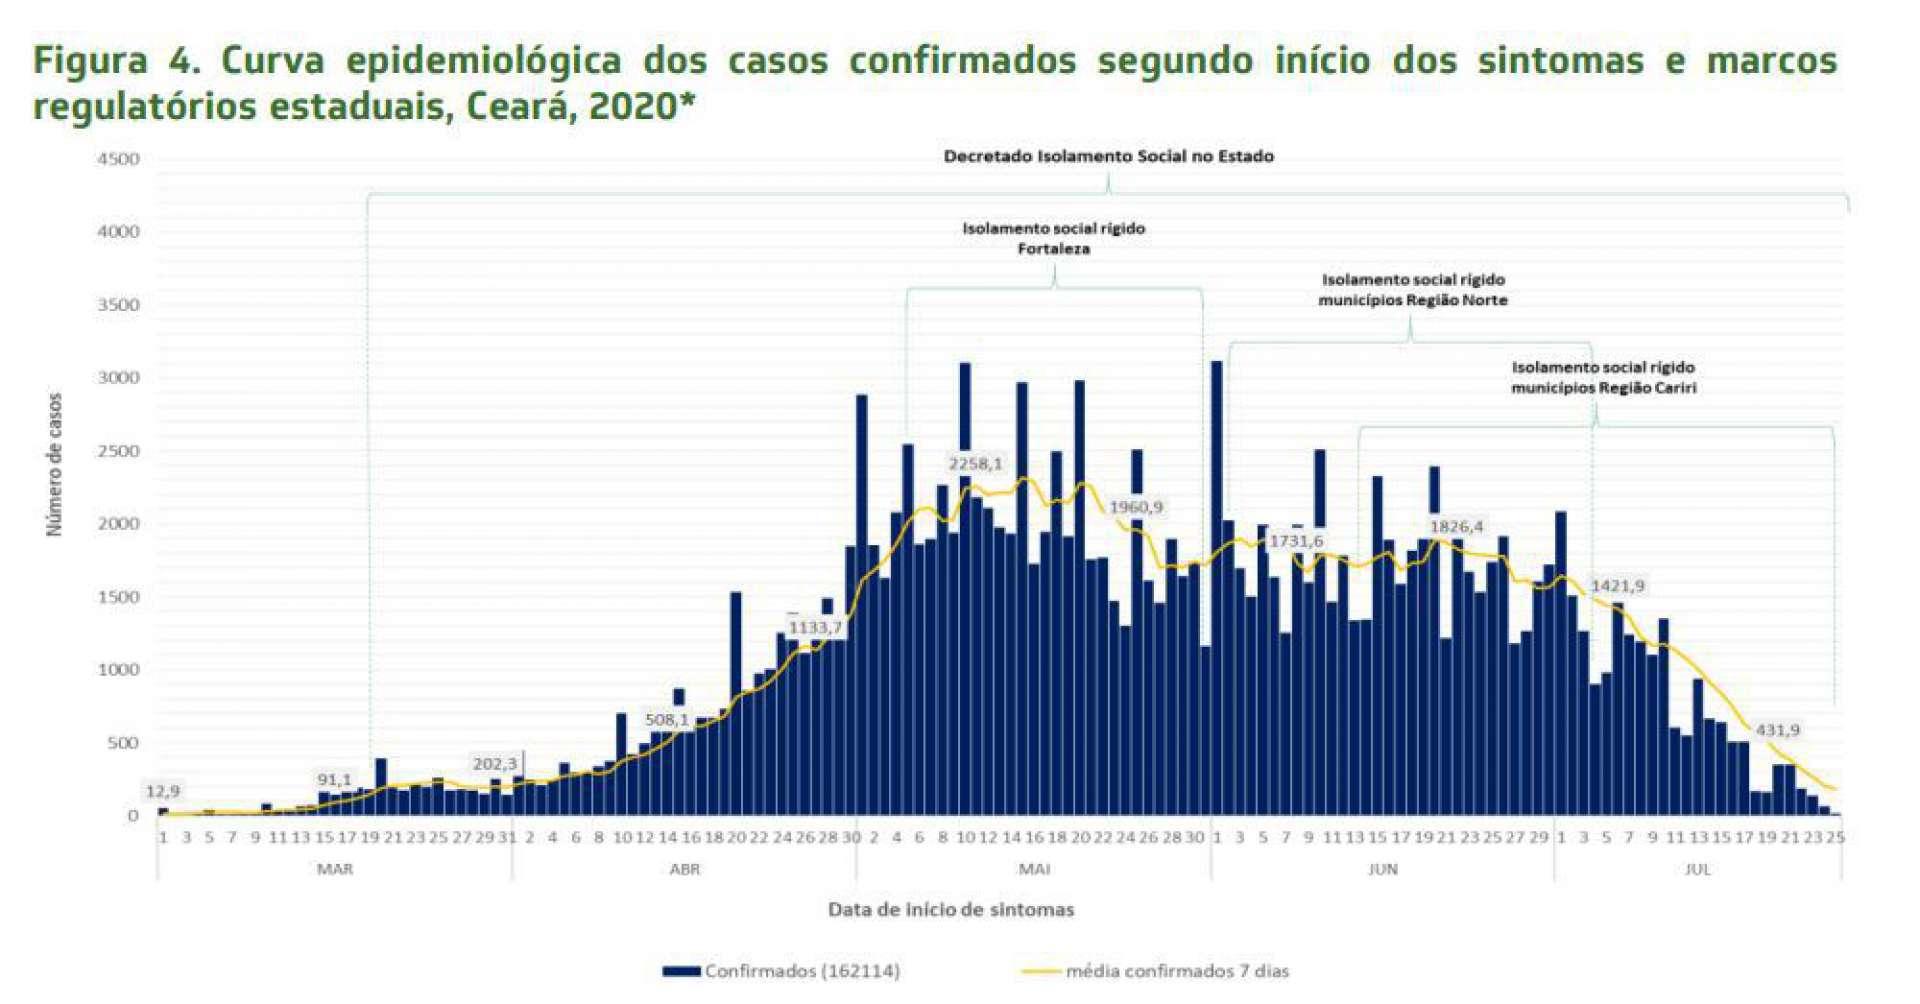 Gráfico que indica a curva epidemiológica de casos confirmados por Covid-19 no Ceará e os períodos de lockdown